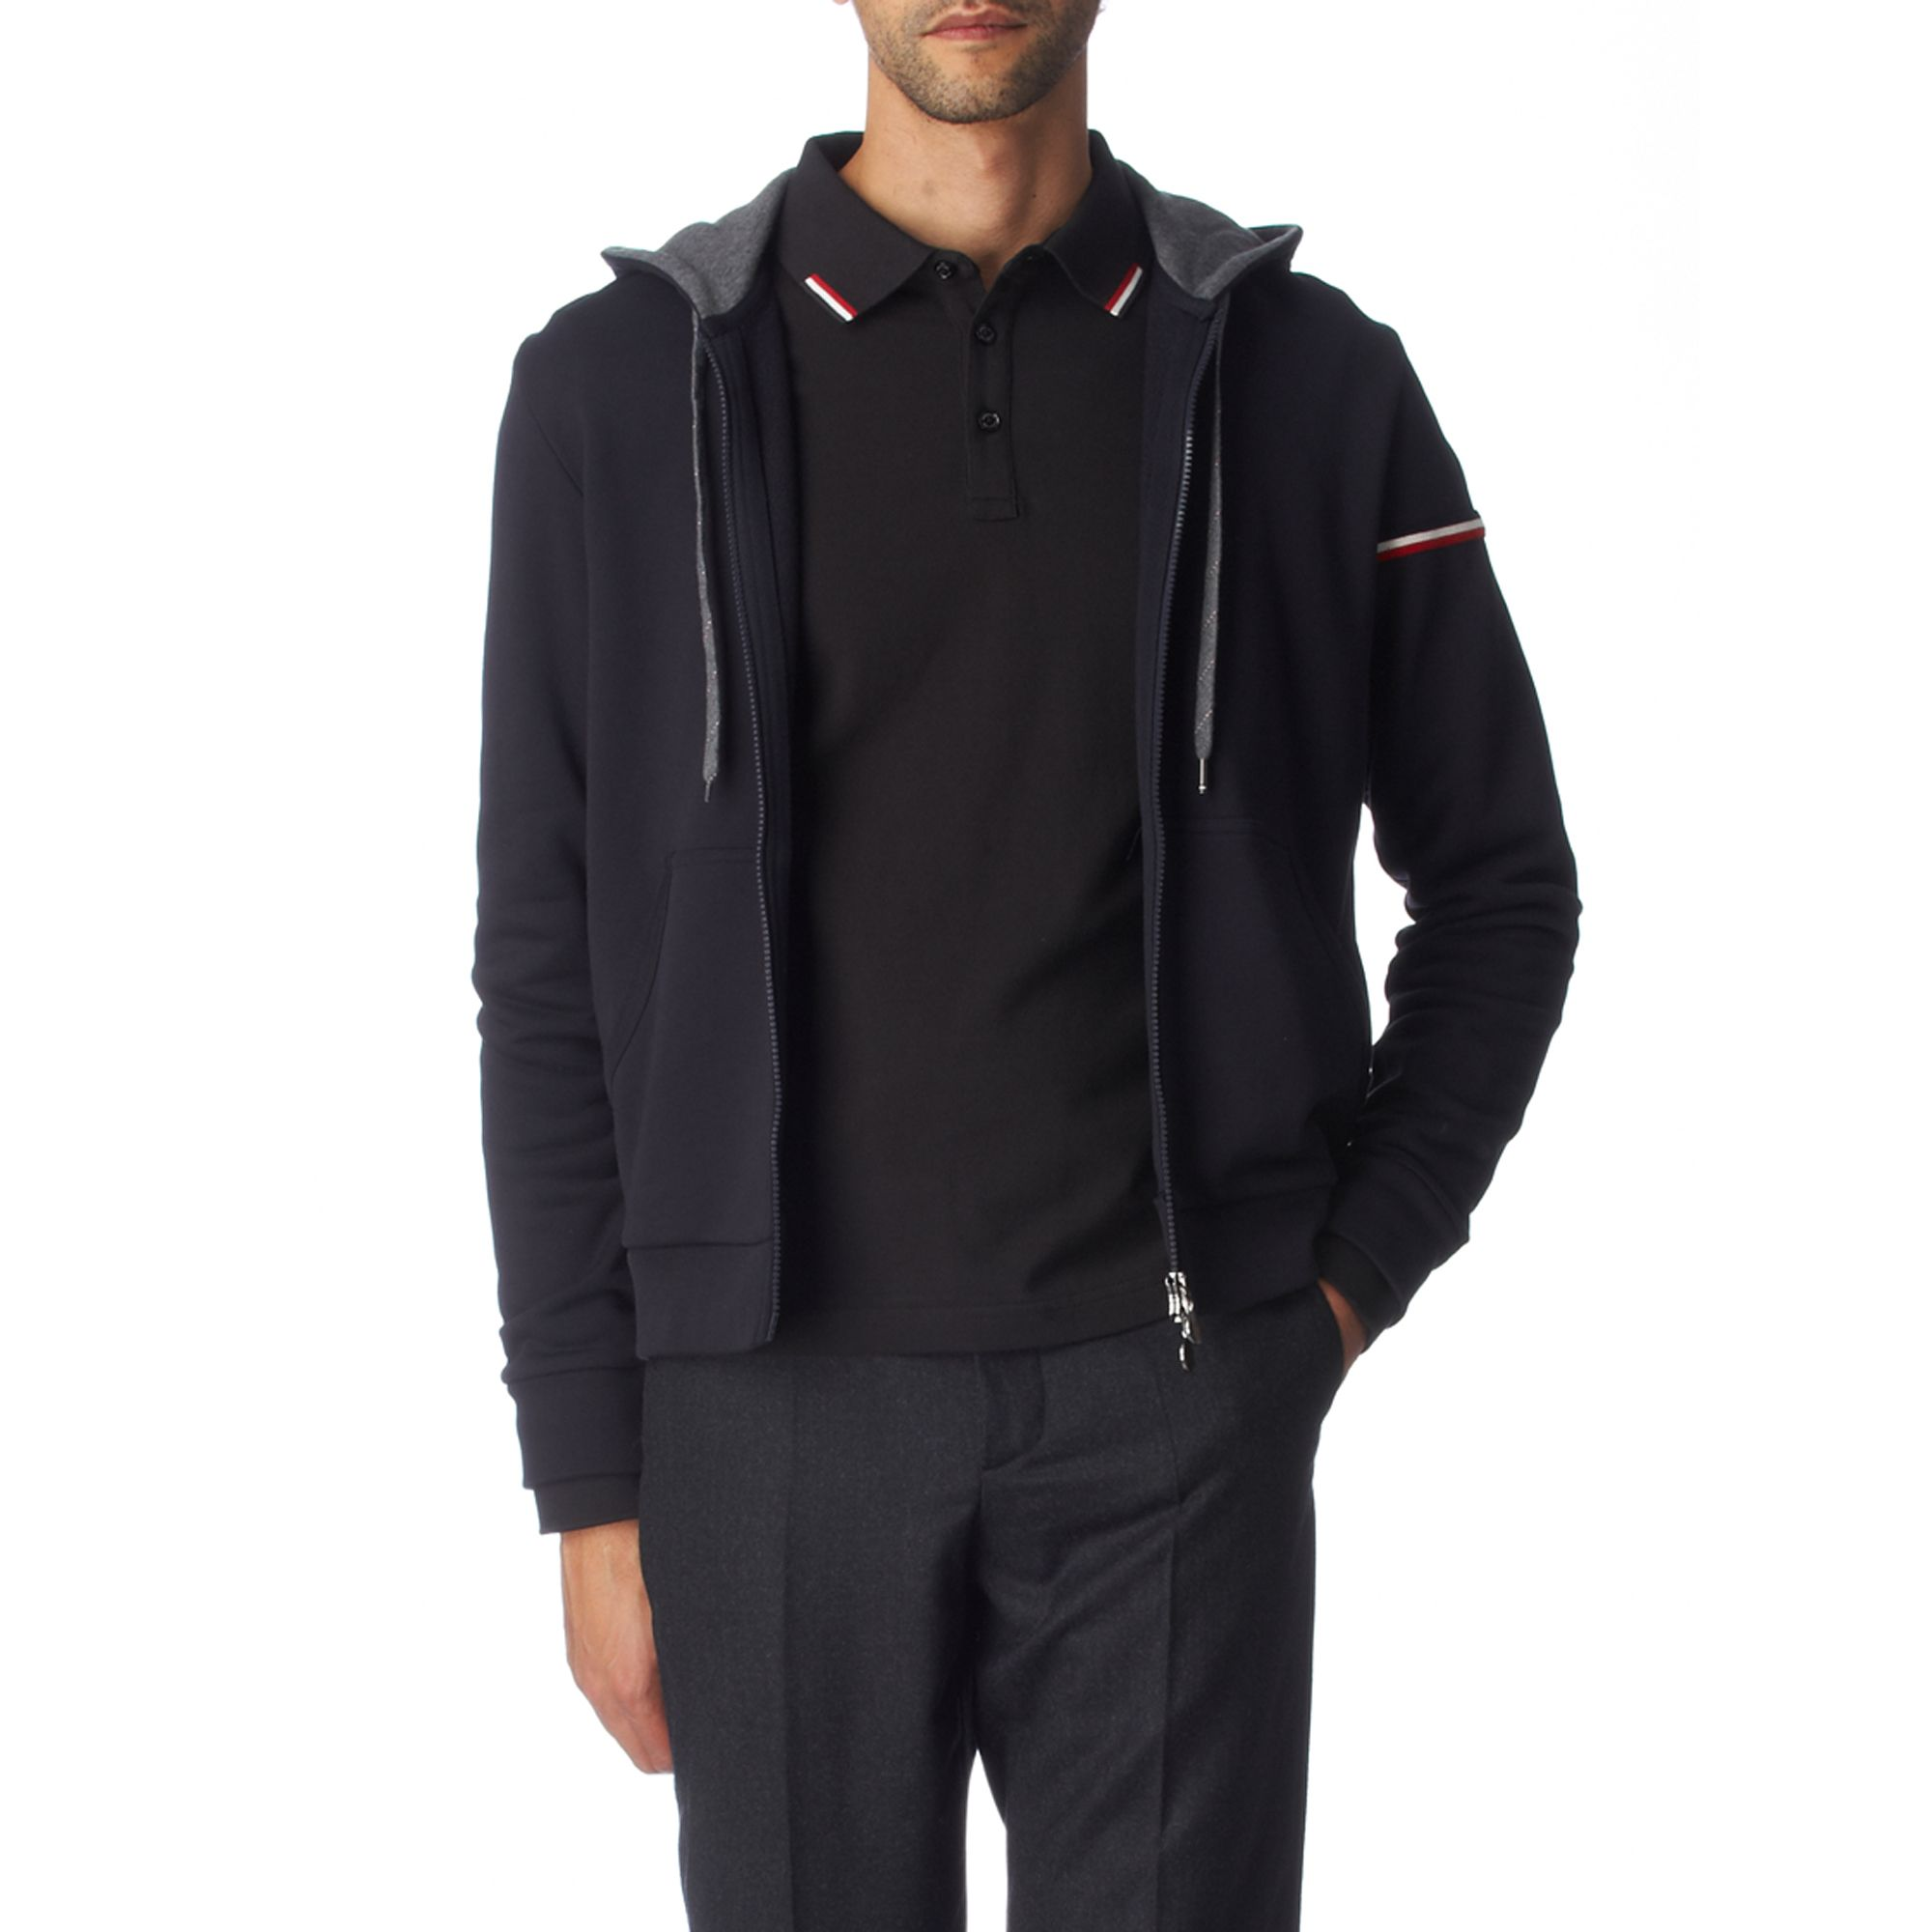 moncler zip hoodie